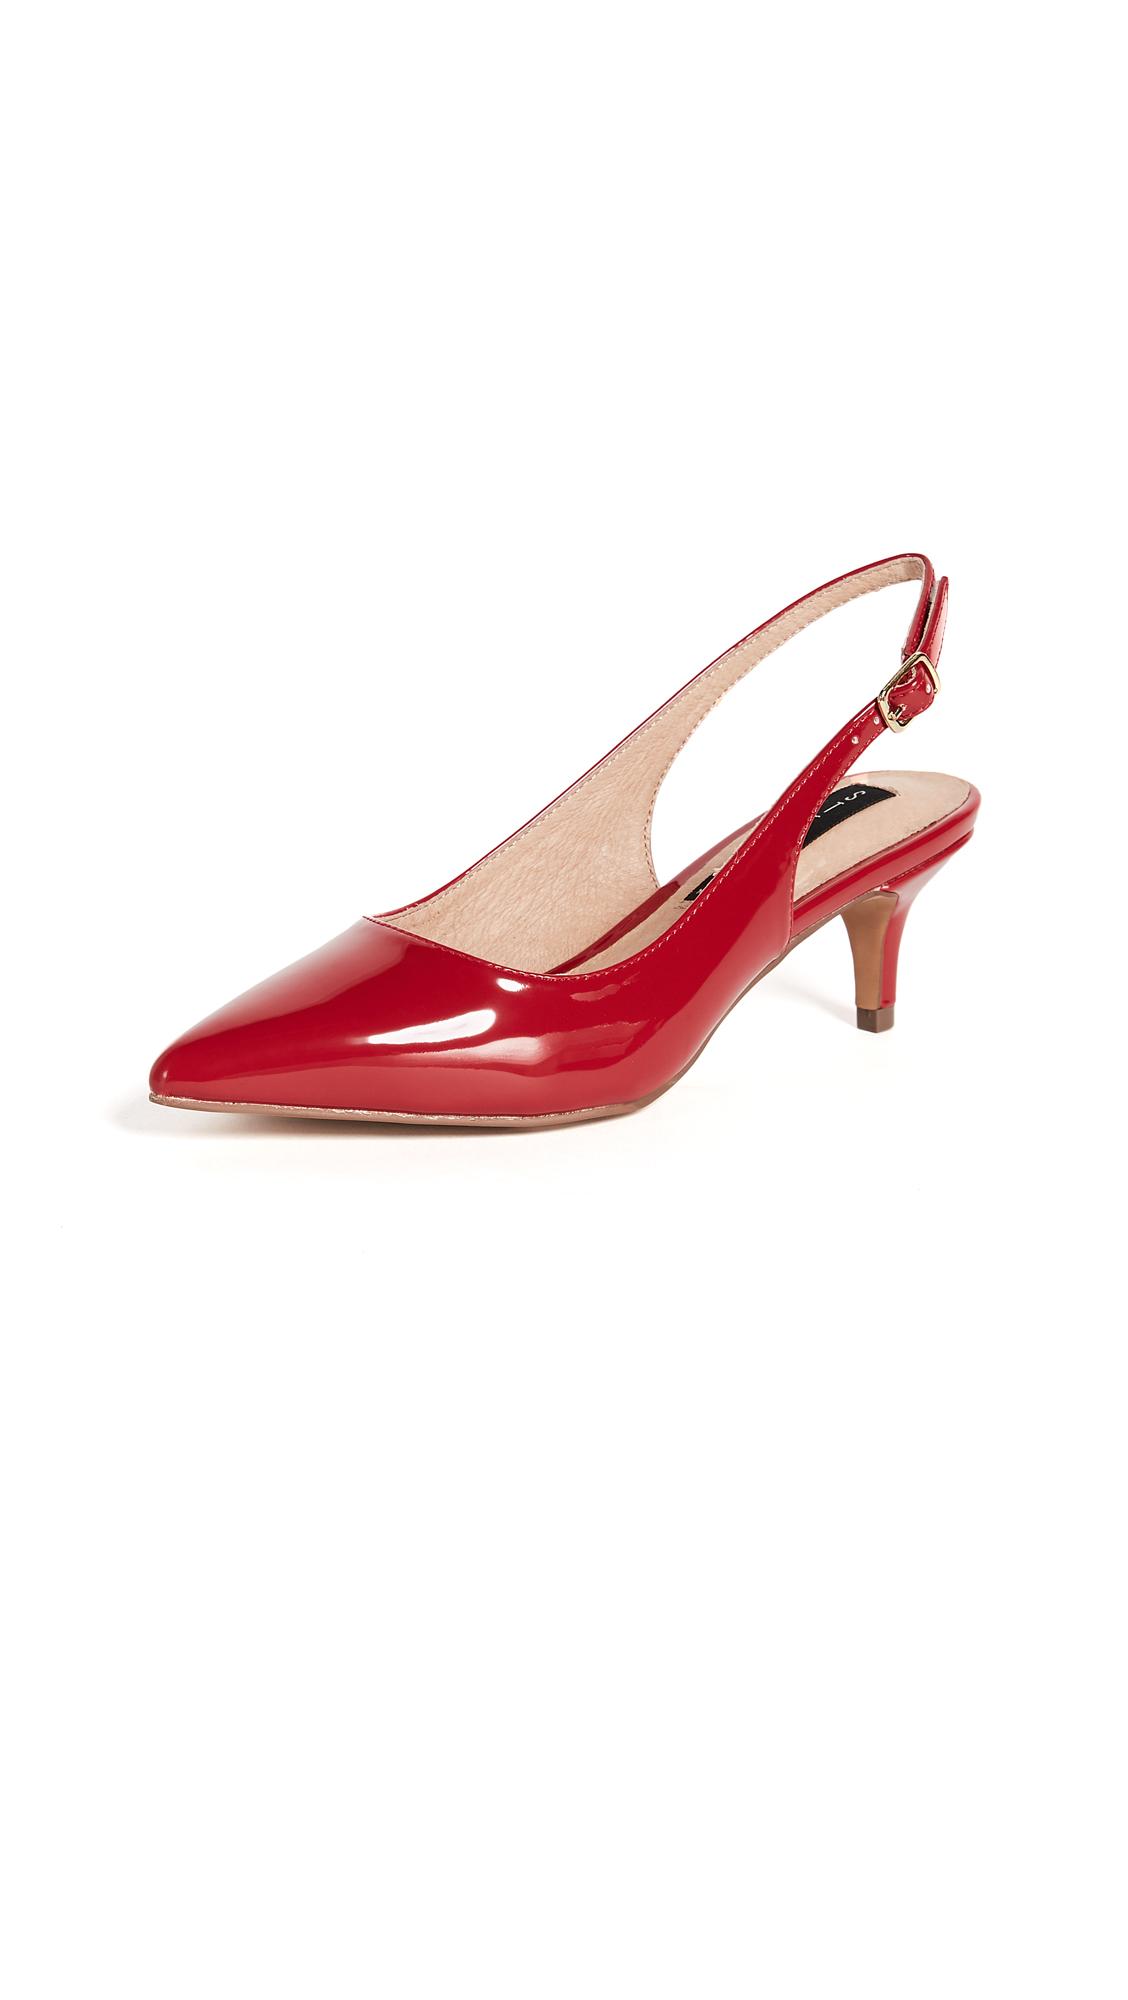 Steven Edyth Point Toe Slingback Pumps - Red